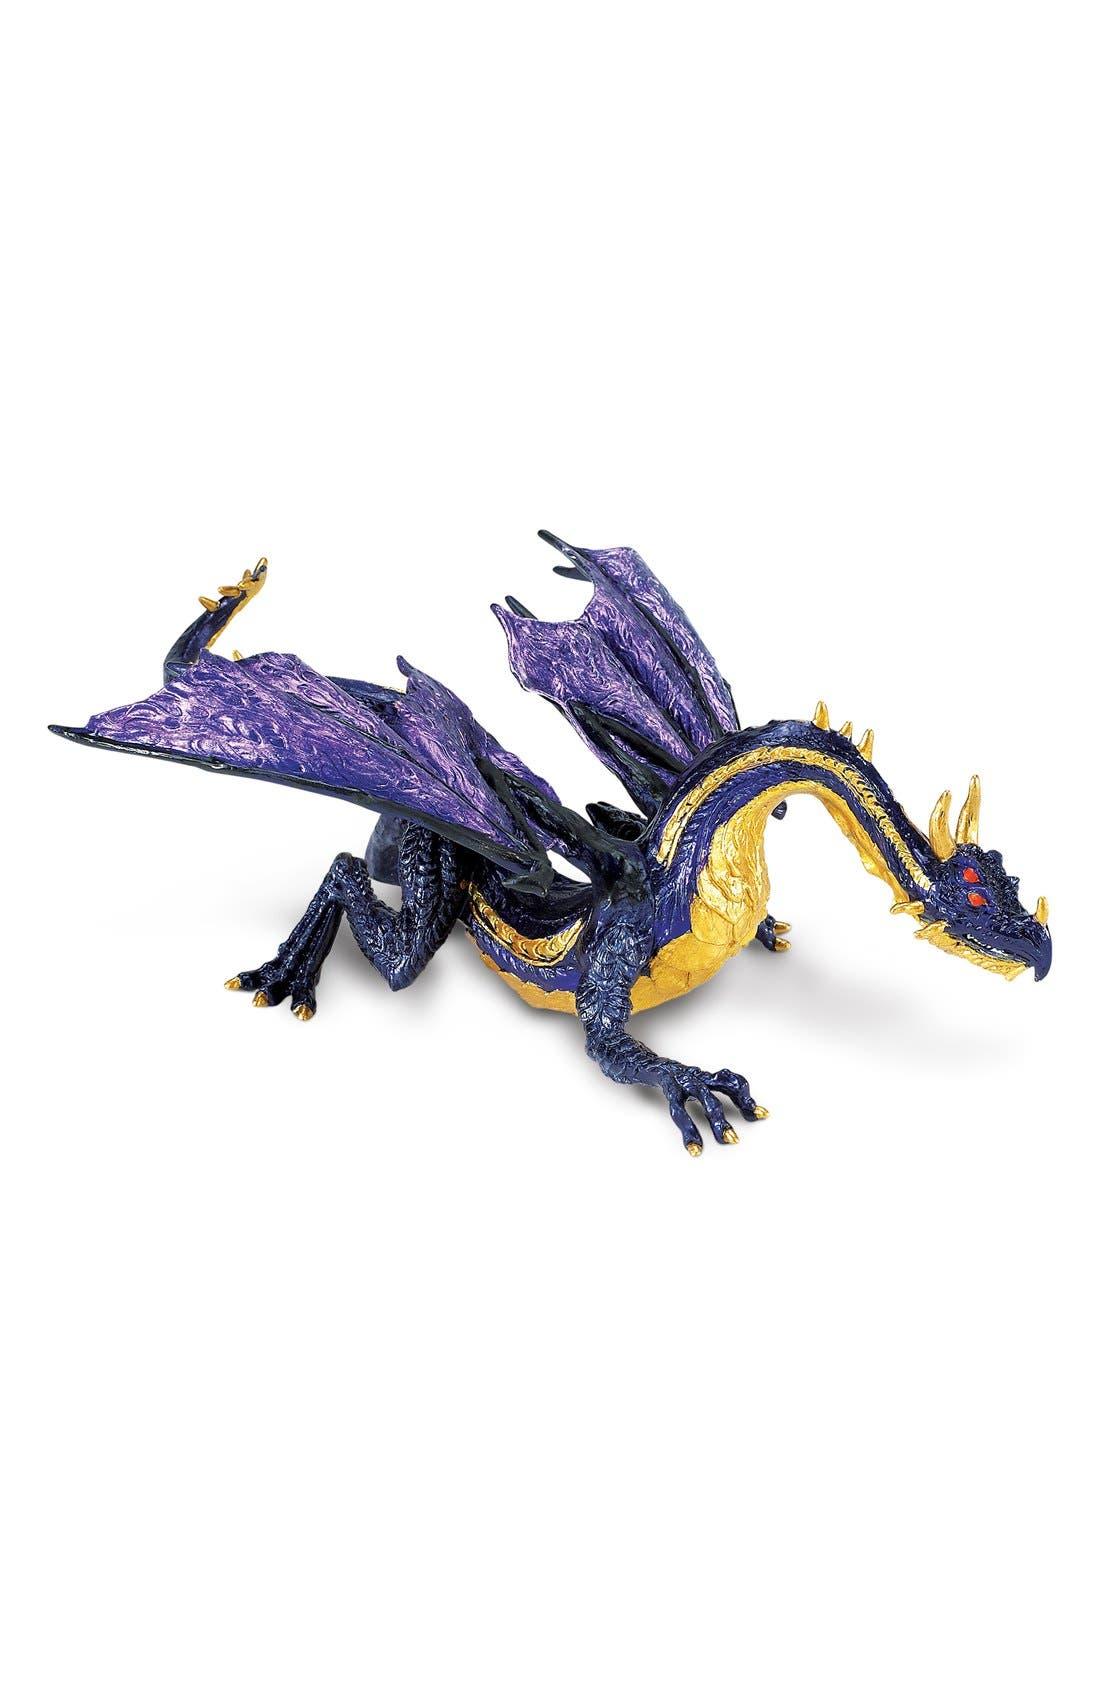 Main Image - Safari Ltd. Midnight Moon Dragon Figurine